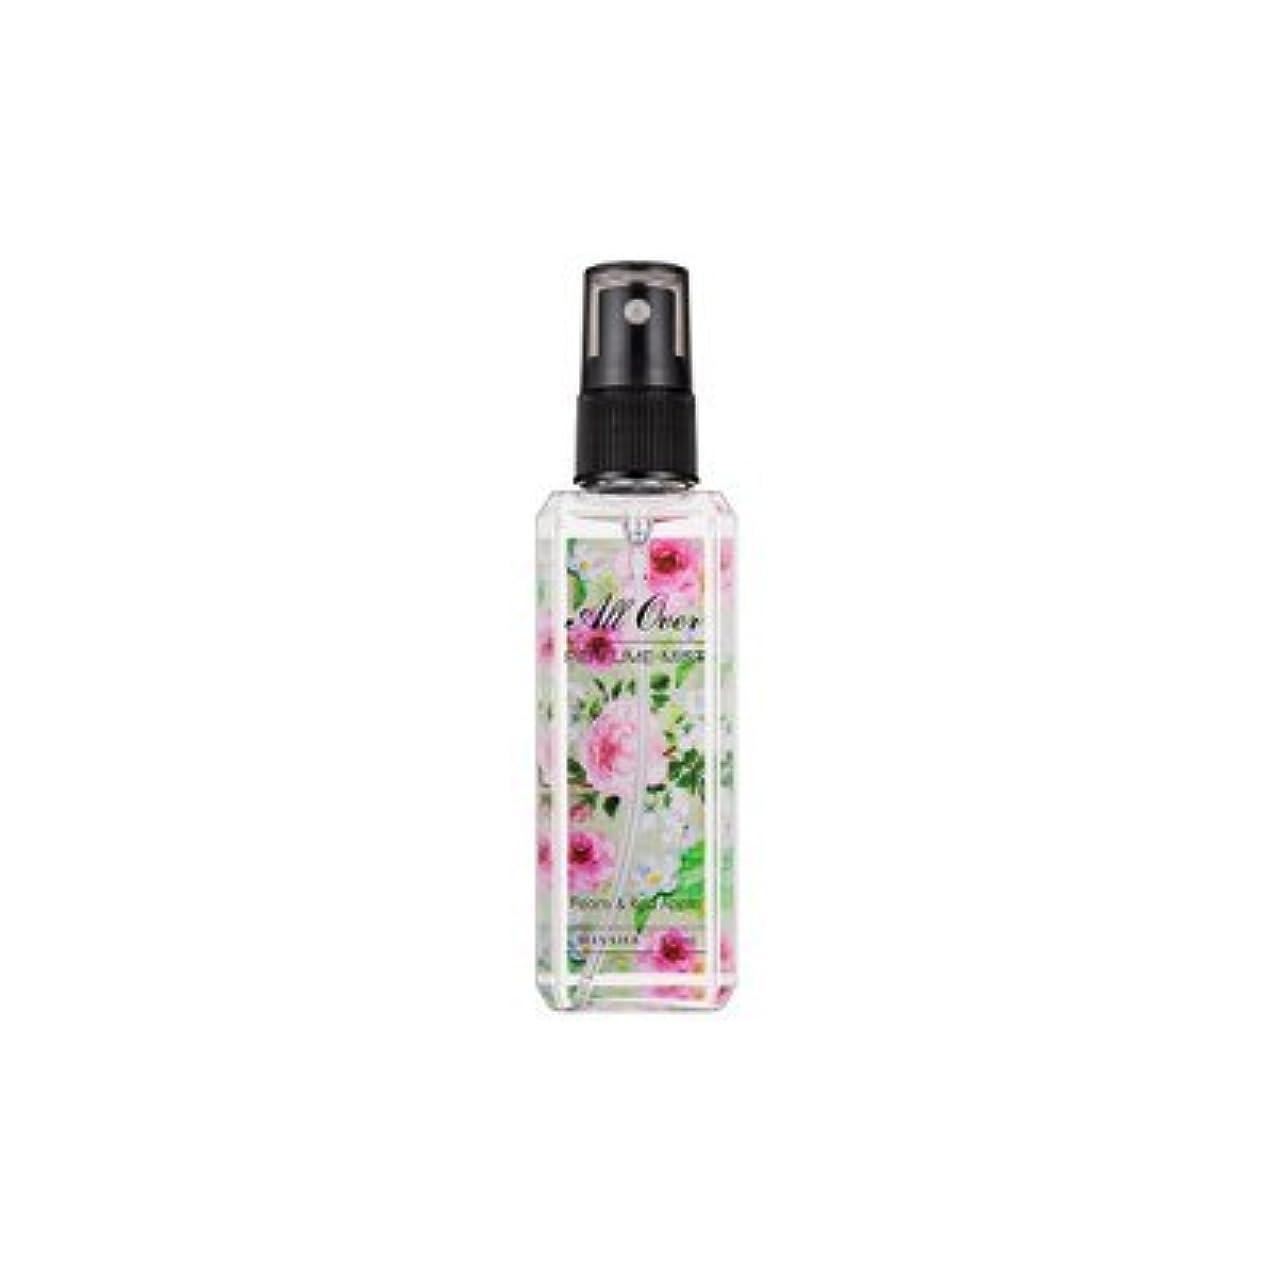 MISSHA All Over Perfumed Mist (Peony & Red Apple)/ ミシャ オールオーバーパフュームミスト (Peony & Red Apple) [並行輸入品]